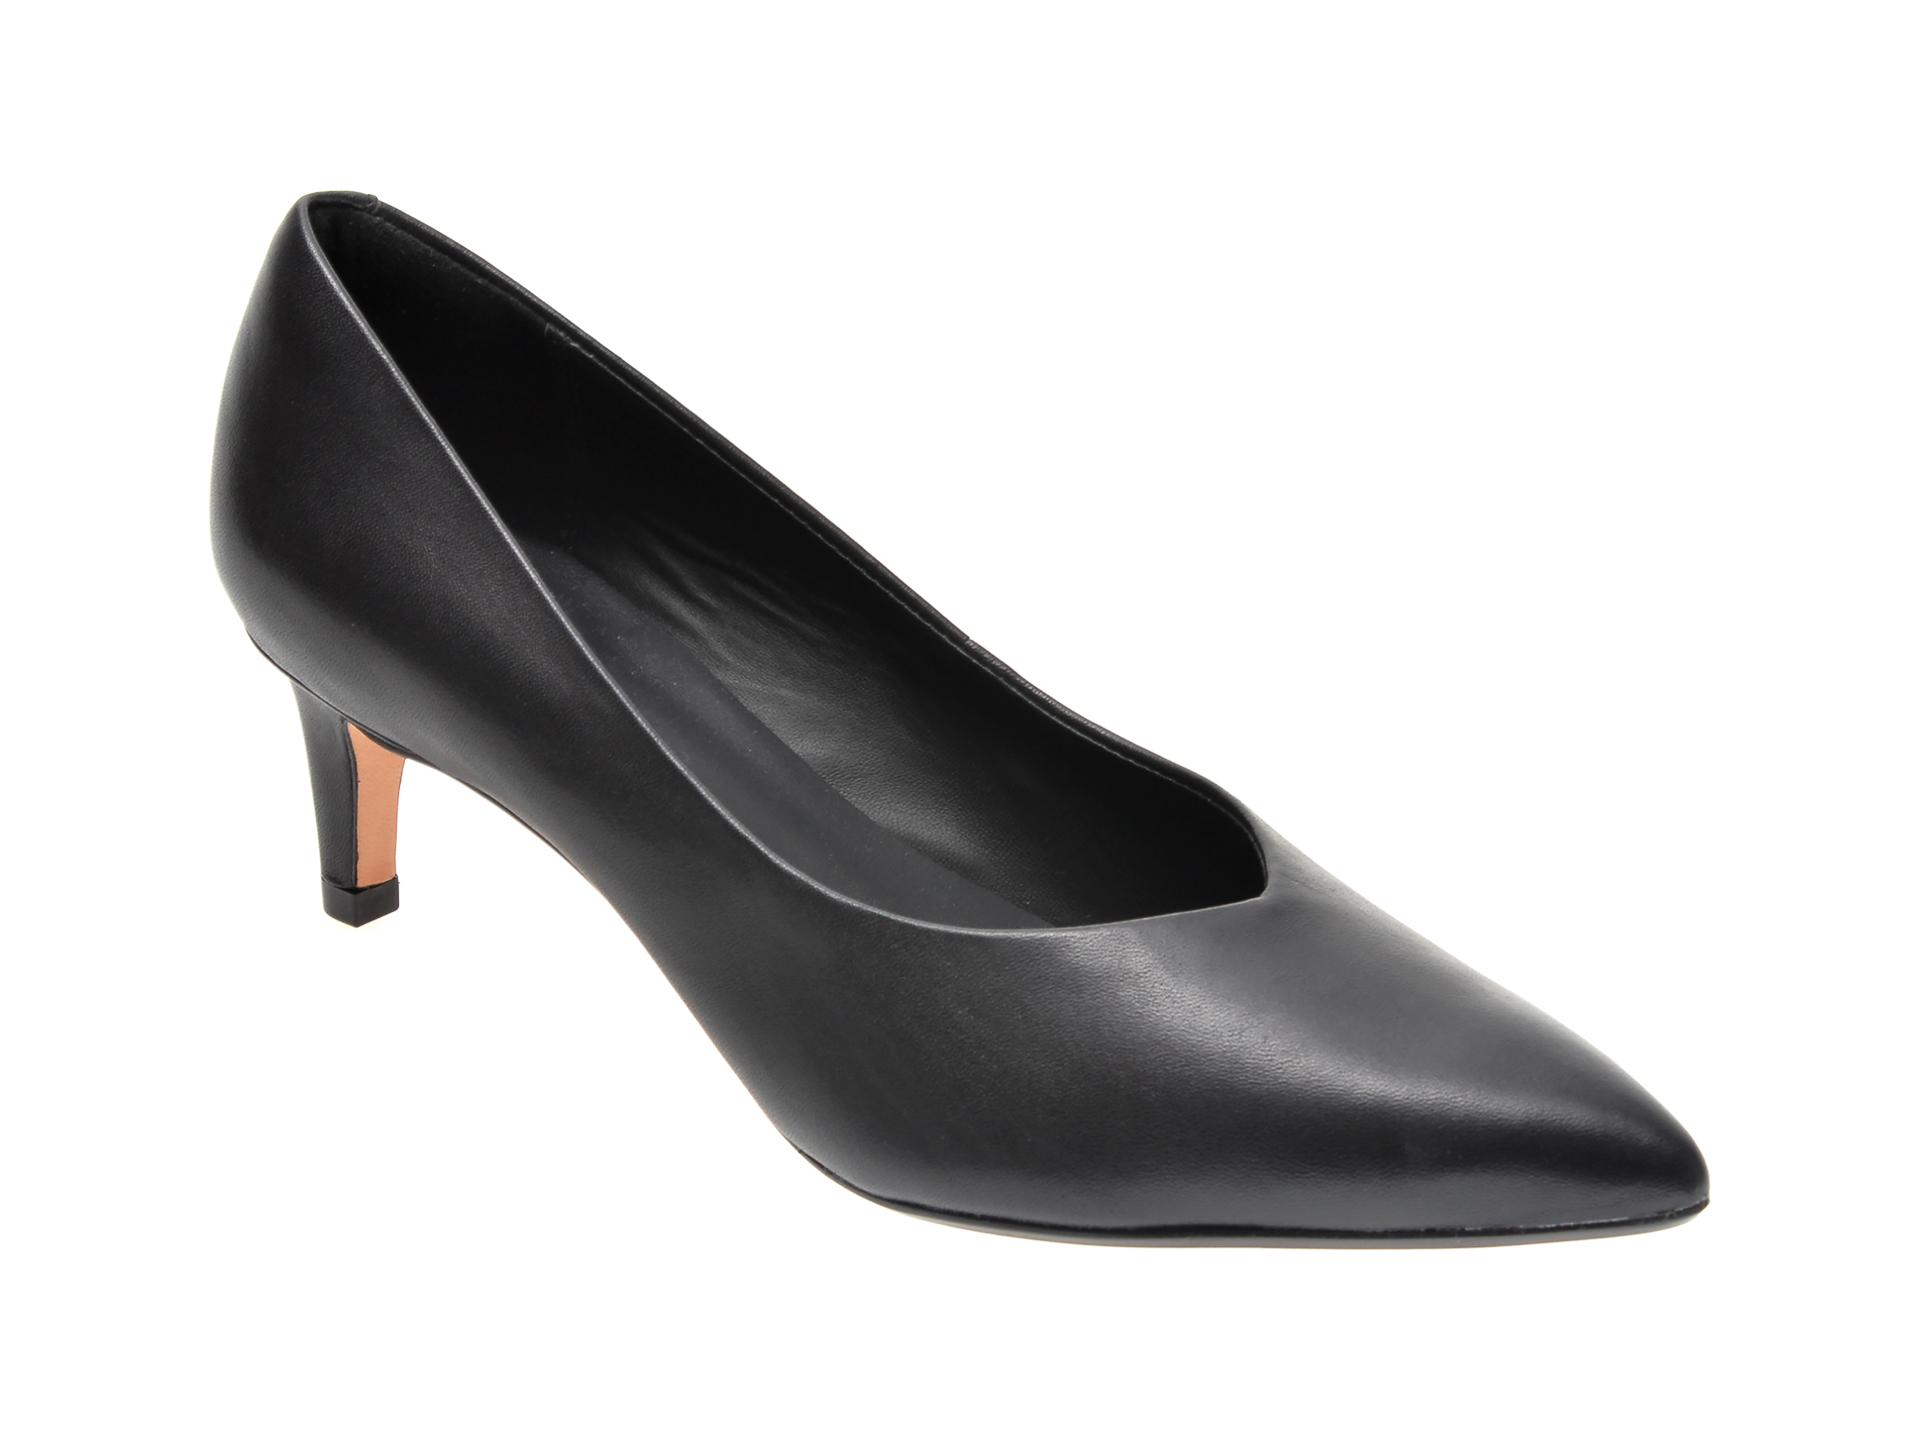 Pantofi CLARKS negri, LAI55C2, din piele naturala